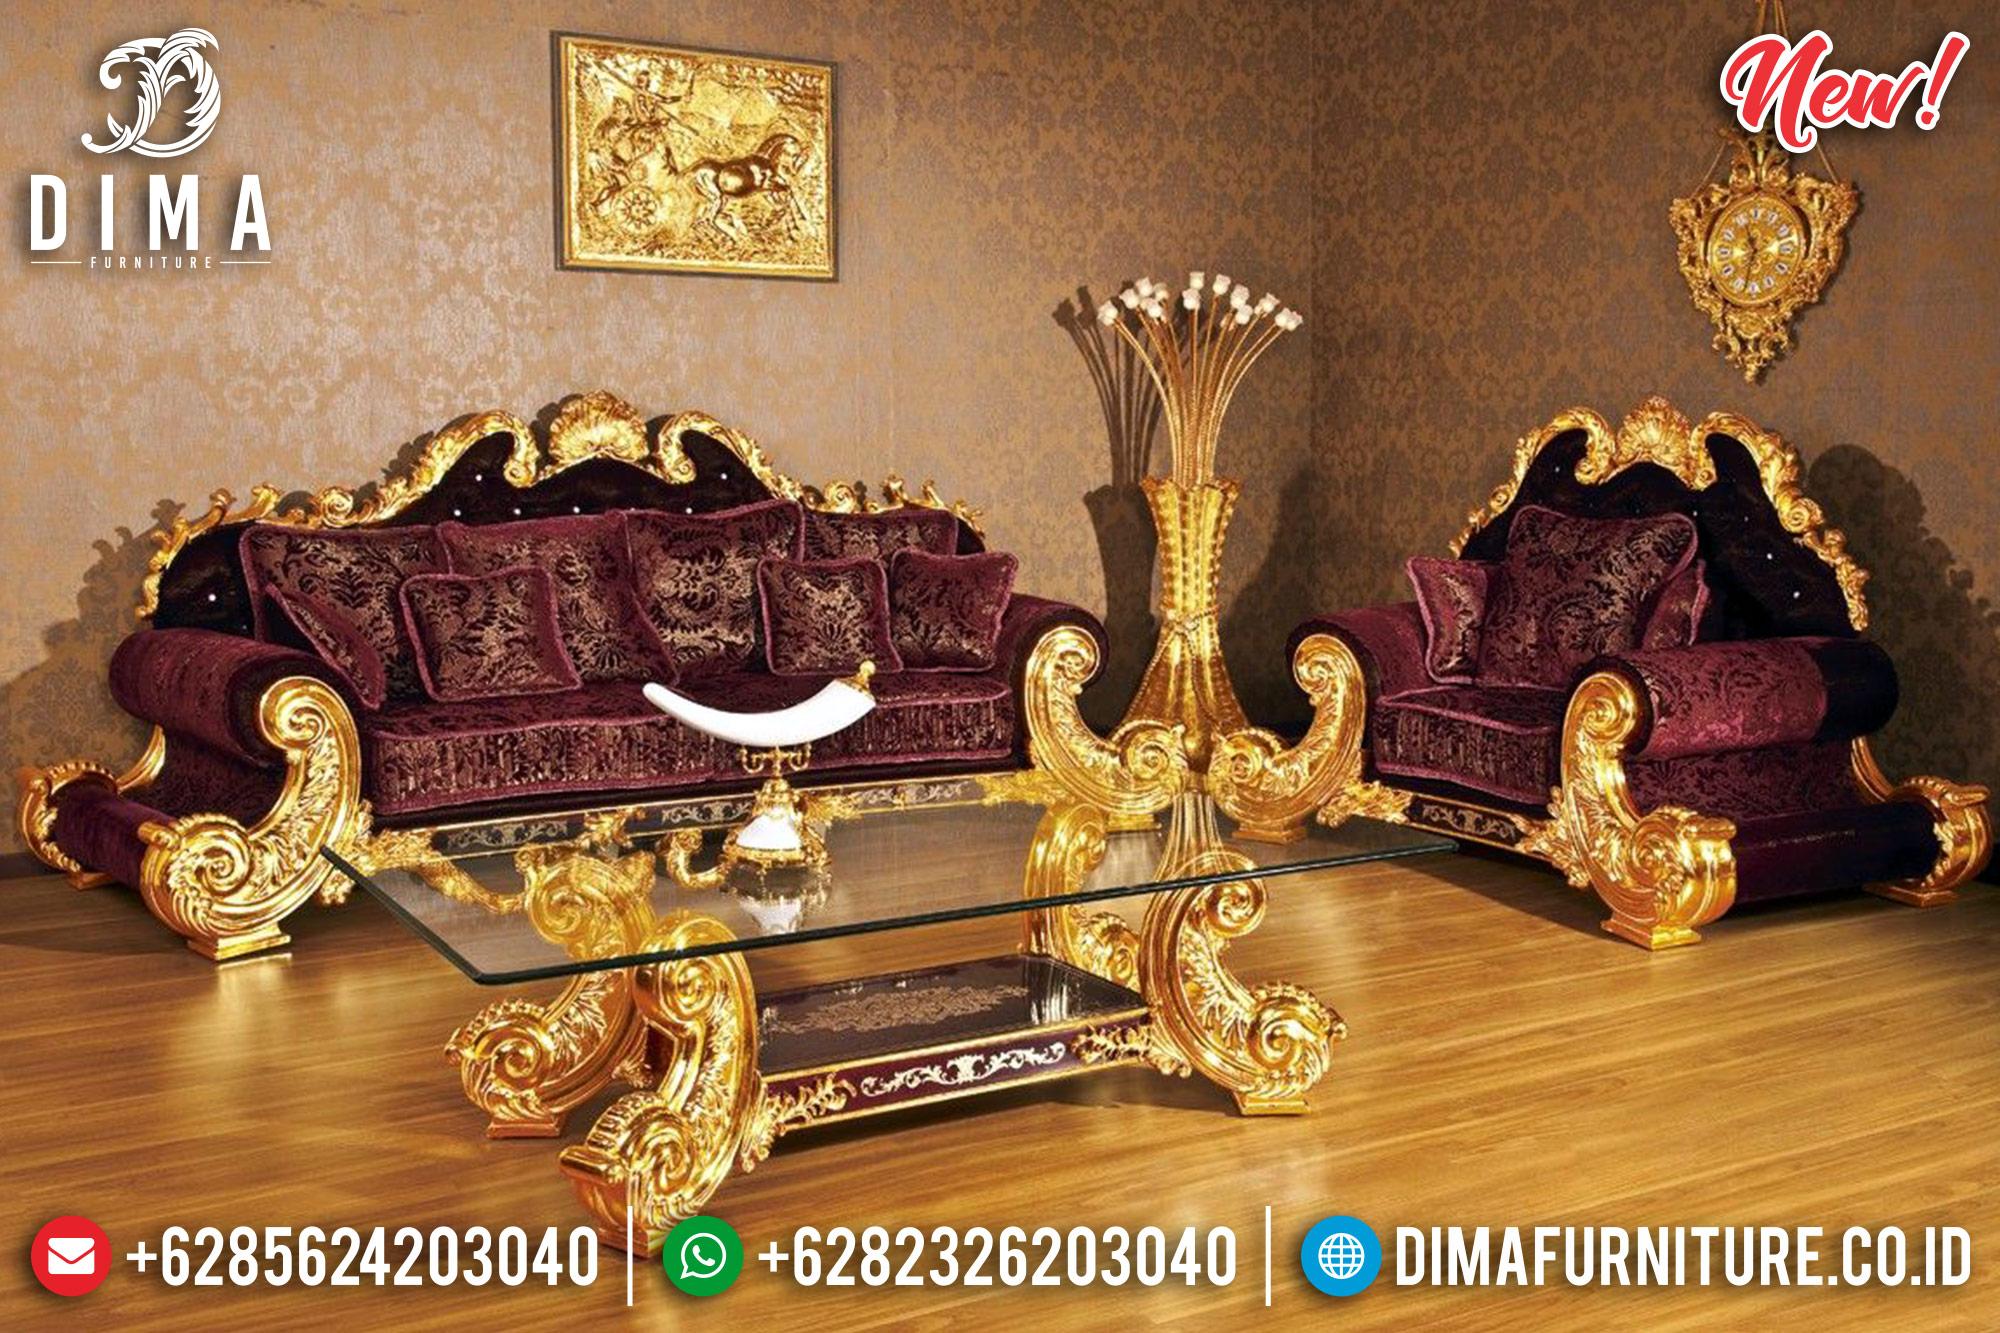 Set 3 2 1 1 Sofa Tamu Mewah Jepara Jackson Gold MMJ-0237